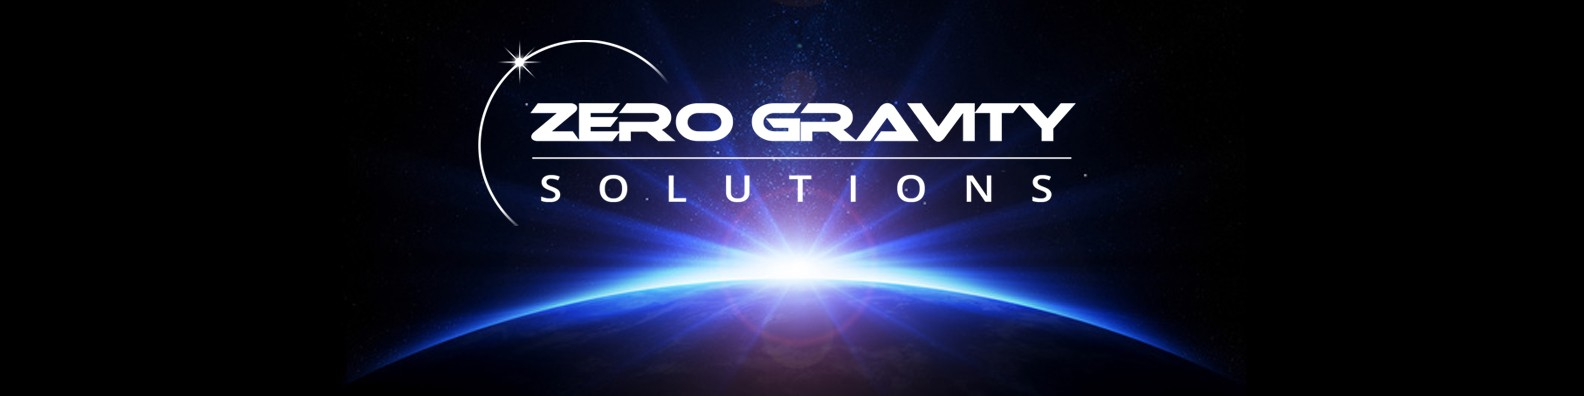 Zero Gravity Solutions, Inc  | LinkedIn